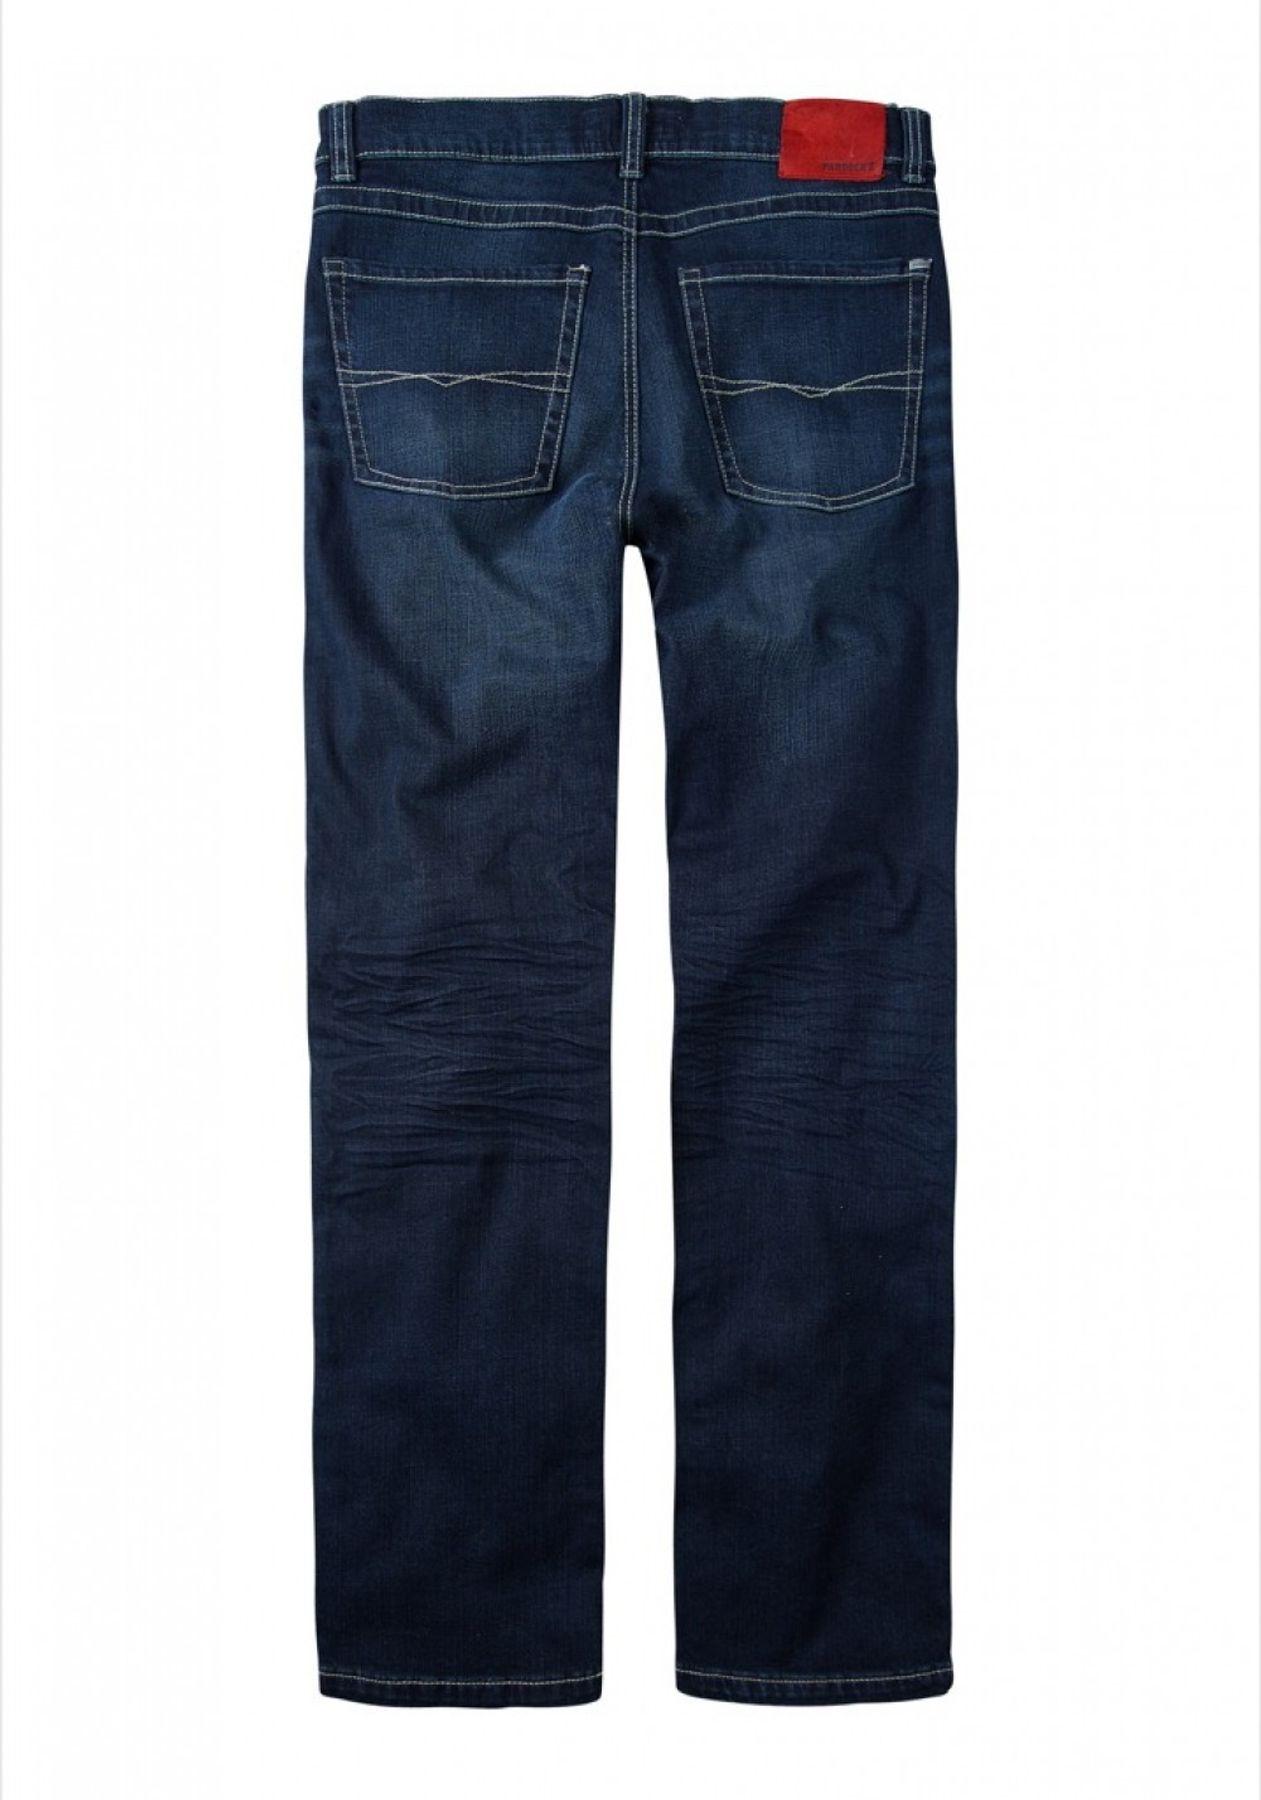 Paddock's Herren 5-Pocket Jeans in Farben blue/black used moustache (5785) und blue dark stone used moustache (5475), Carter 80 016 5024 – Bild 4